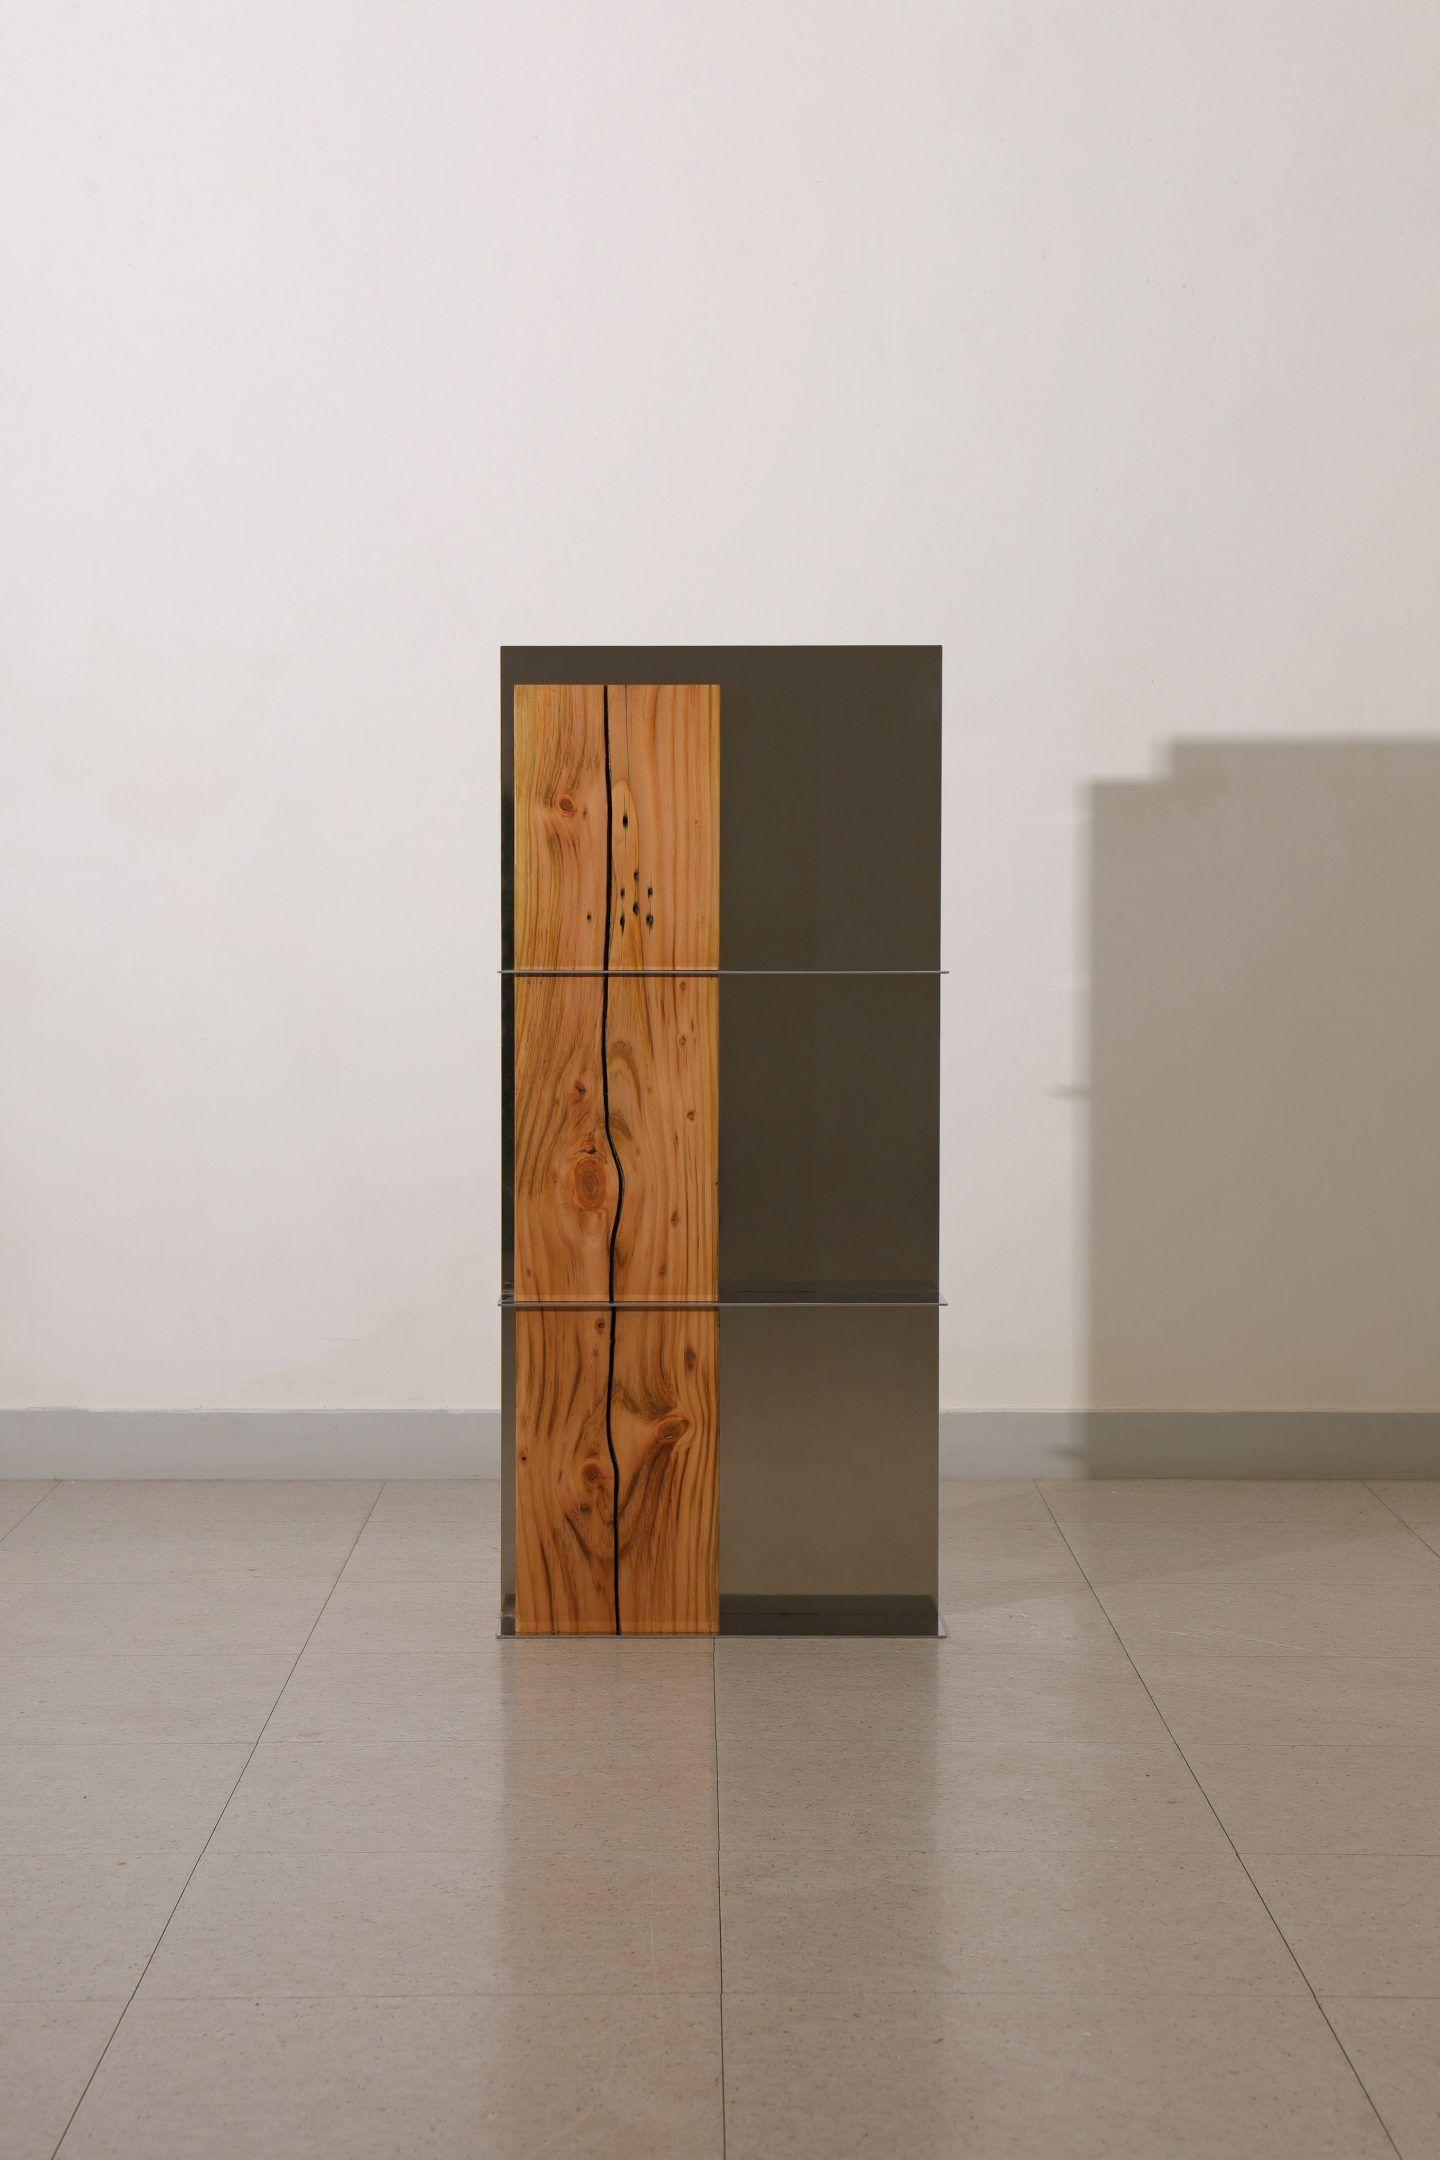 IGNANT-Design-Shinkyu-Shon-Split-Collection-06